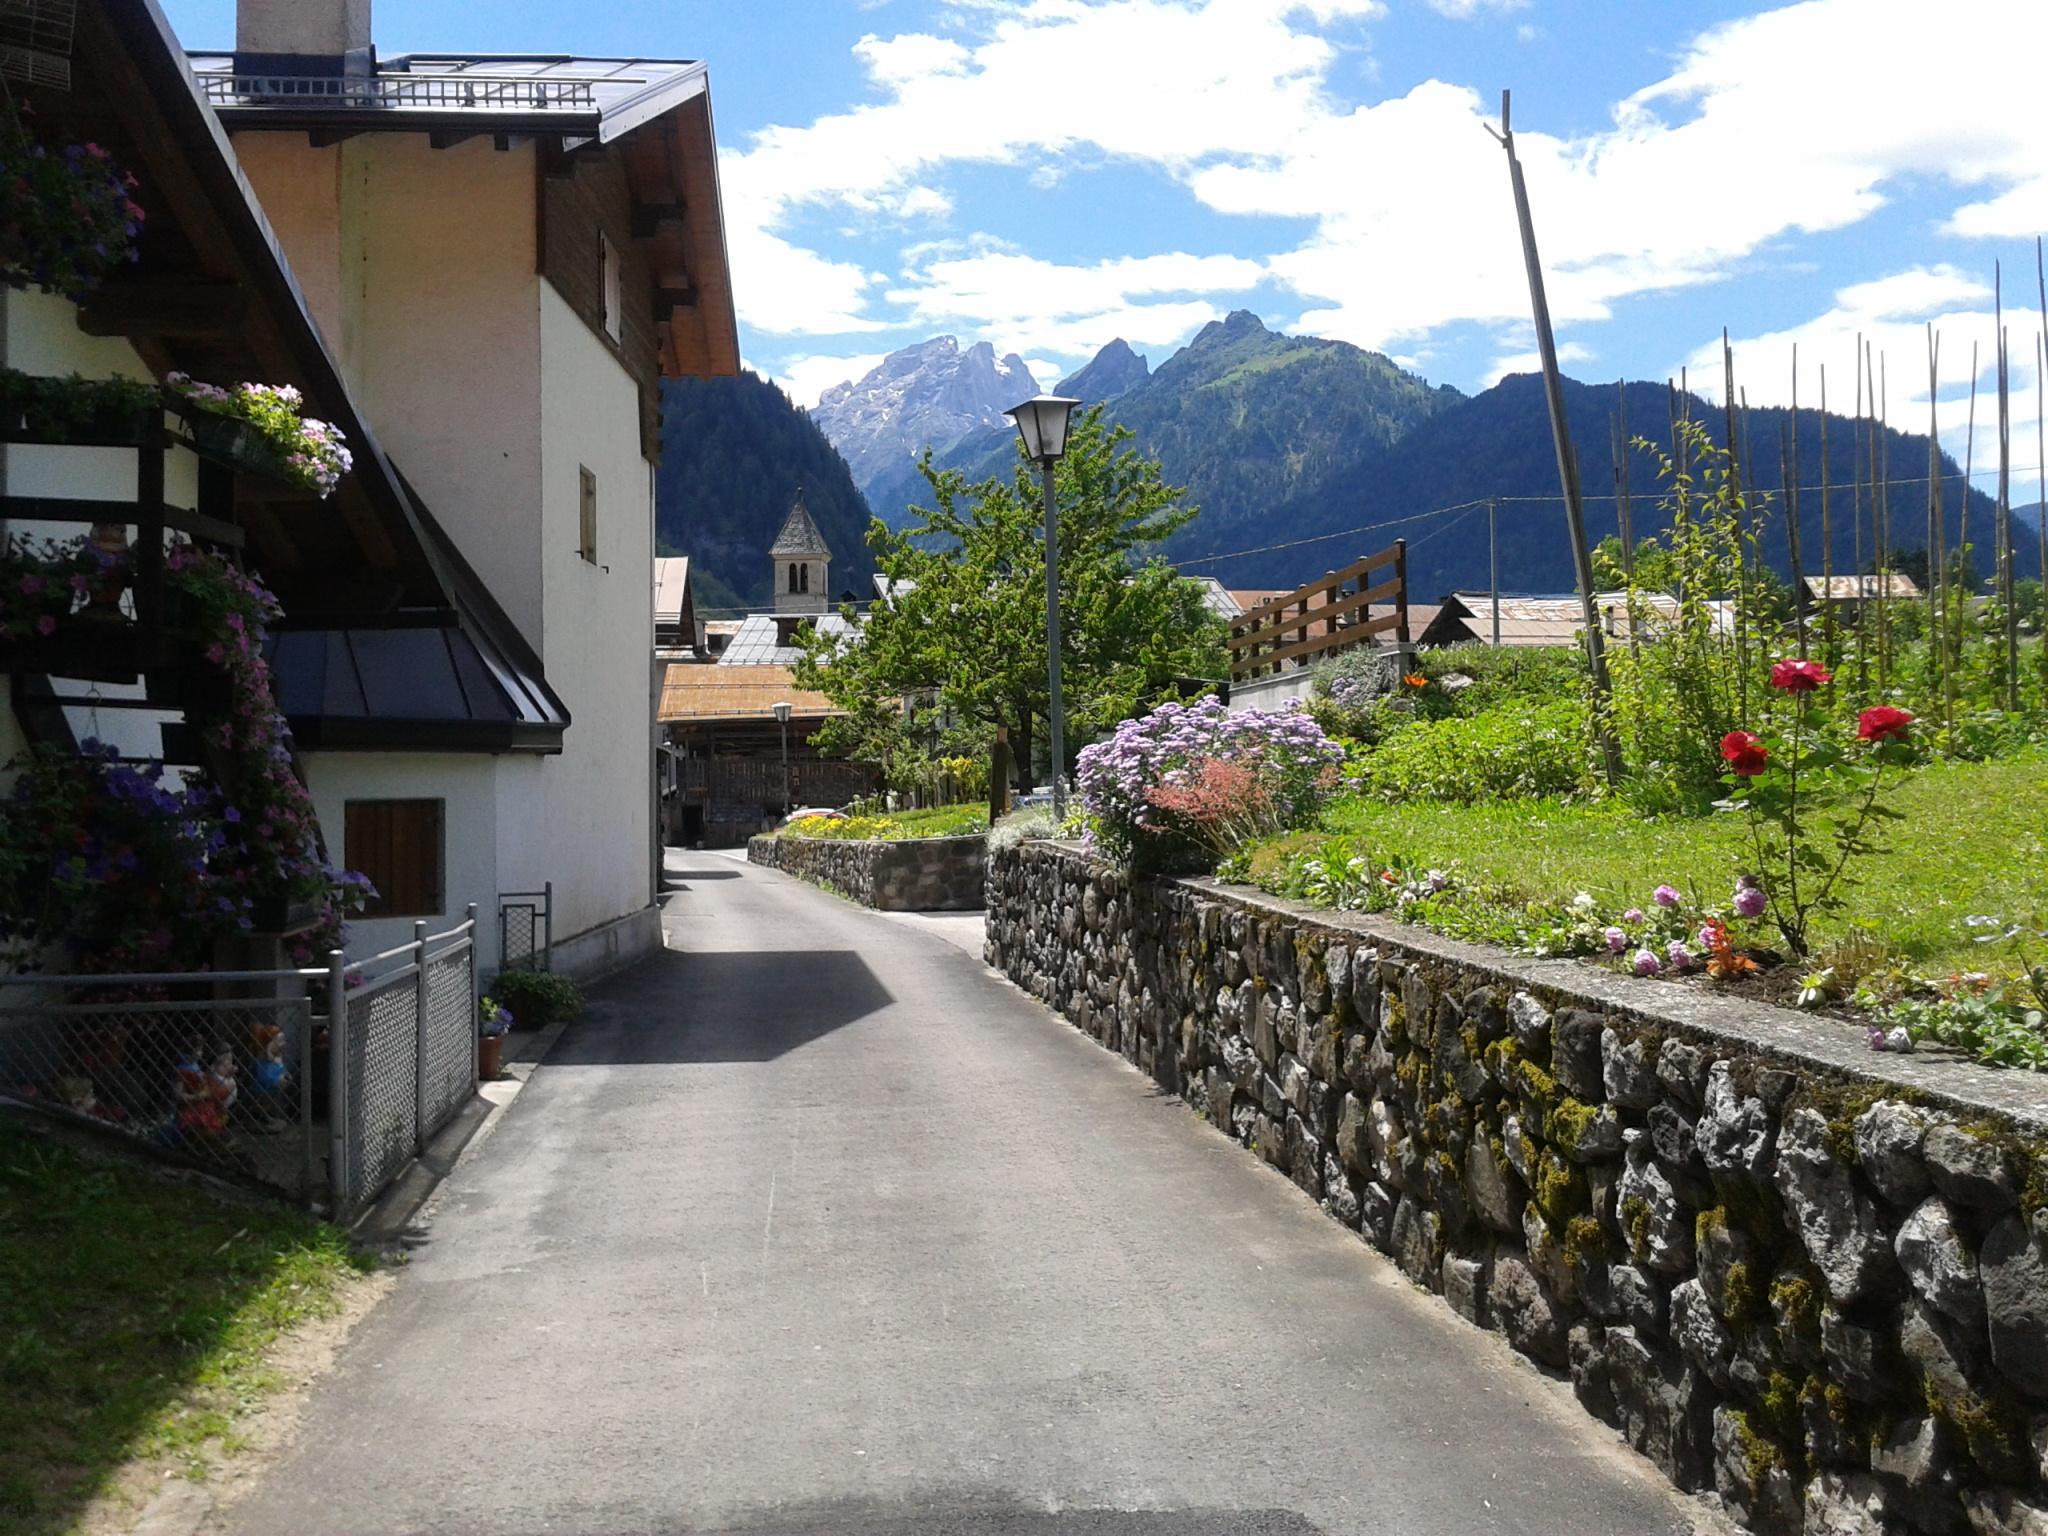 Dolomites July 2011 029